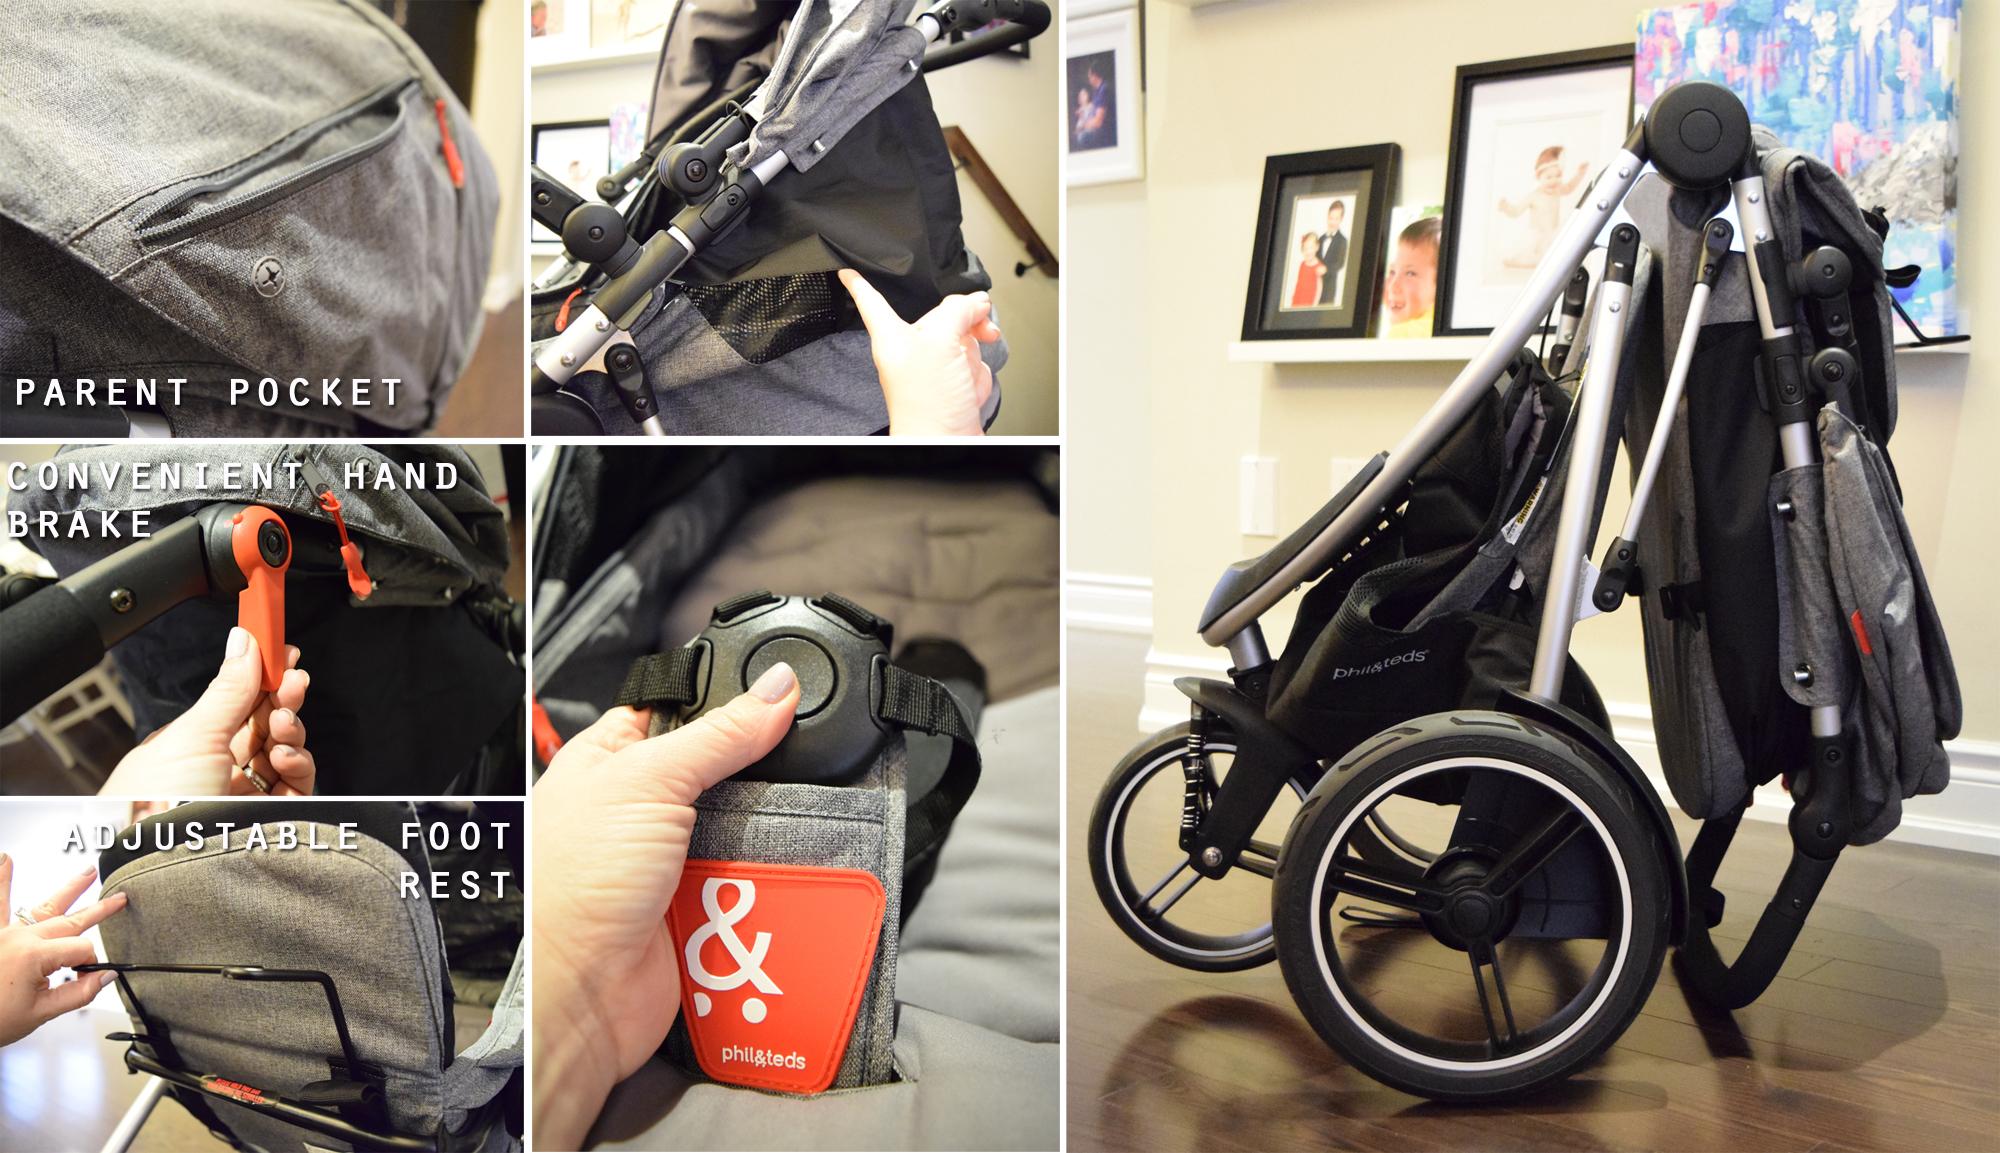 phil  teds Dash stroller  Mommy Gearest